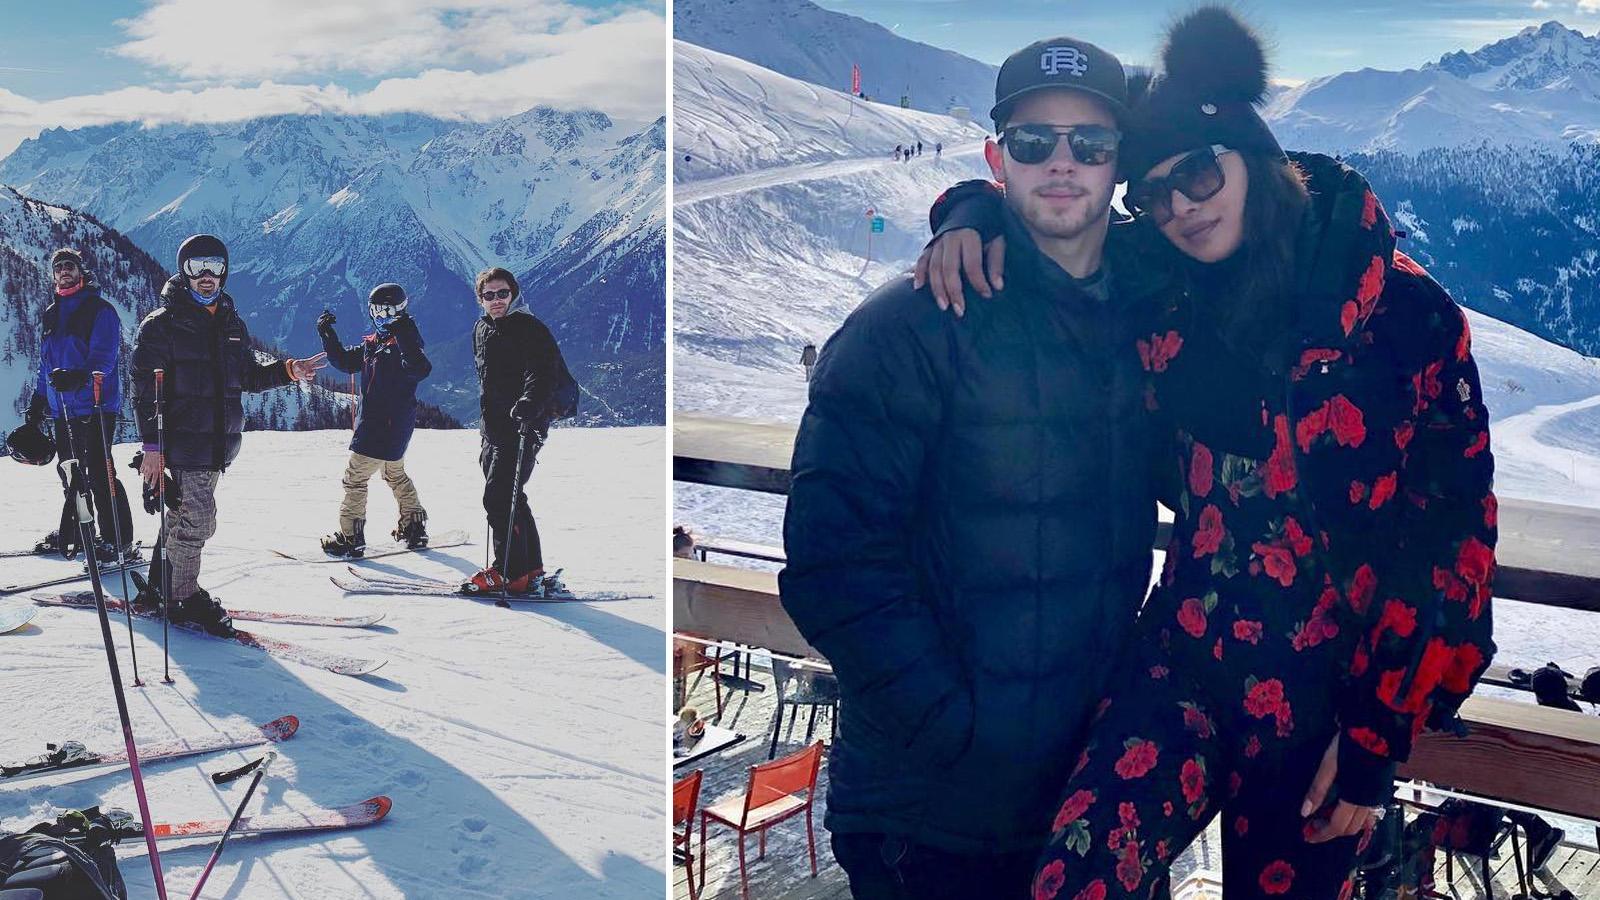 Nick Jonas flaunts skiing skills; wife Priyanka Chopra finds it 'hot'